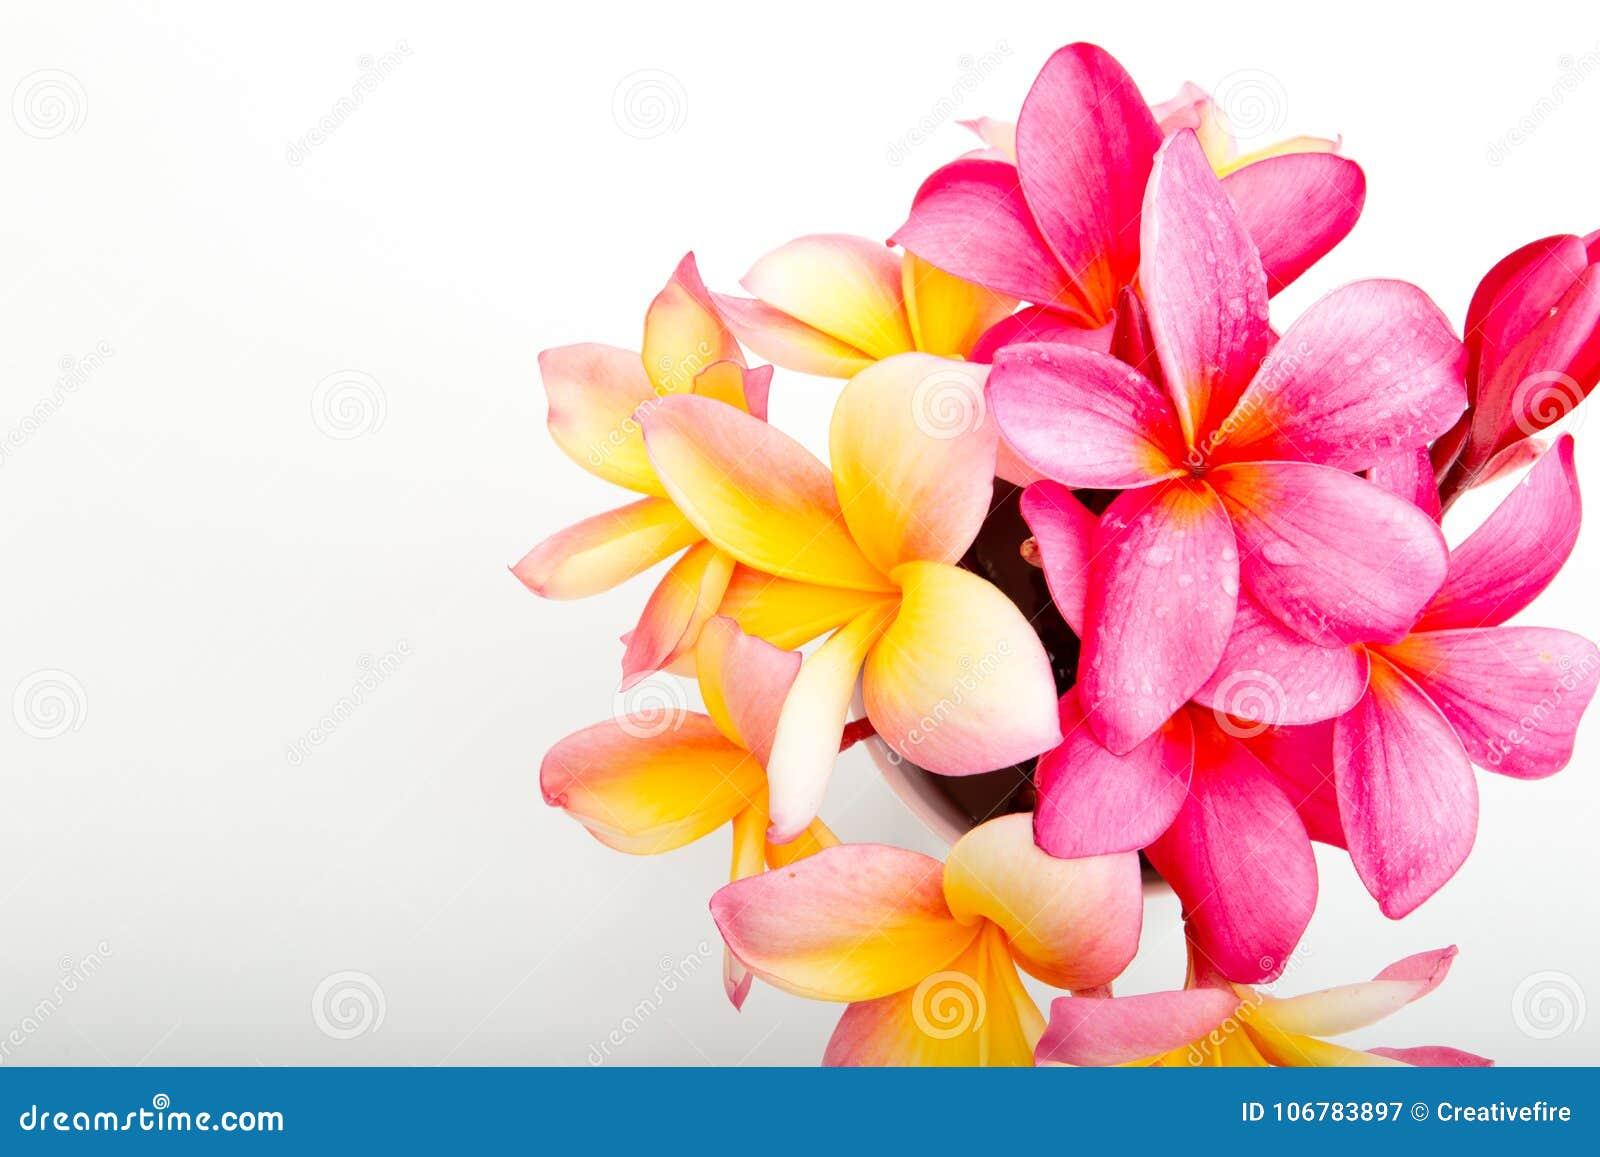 Tropical Pink And Yellow Frangipani Flowers Stock Image Image Of